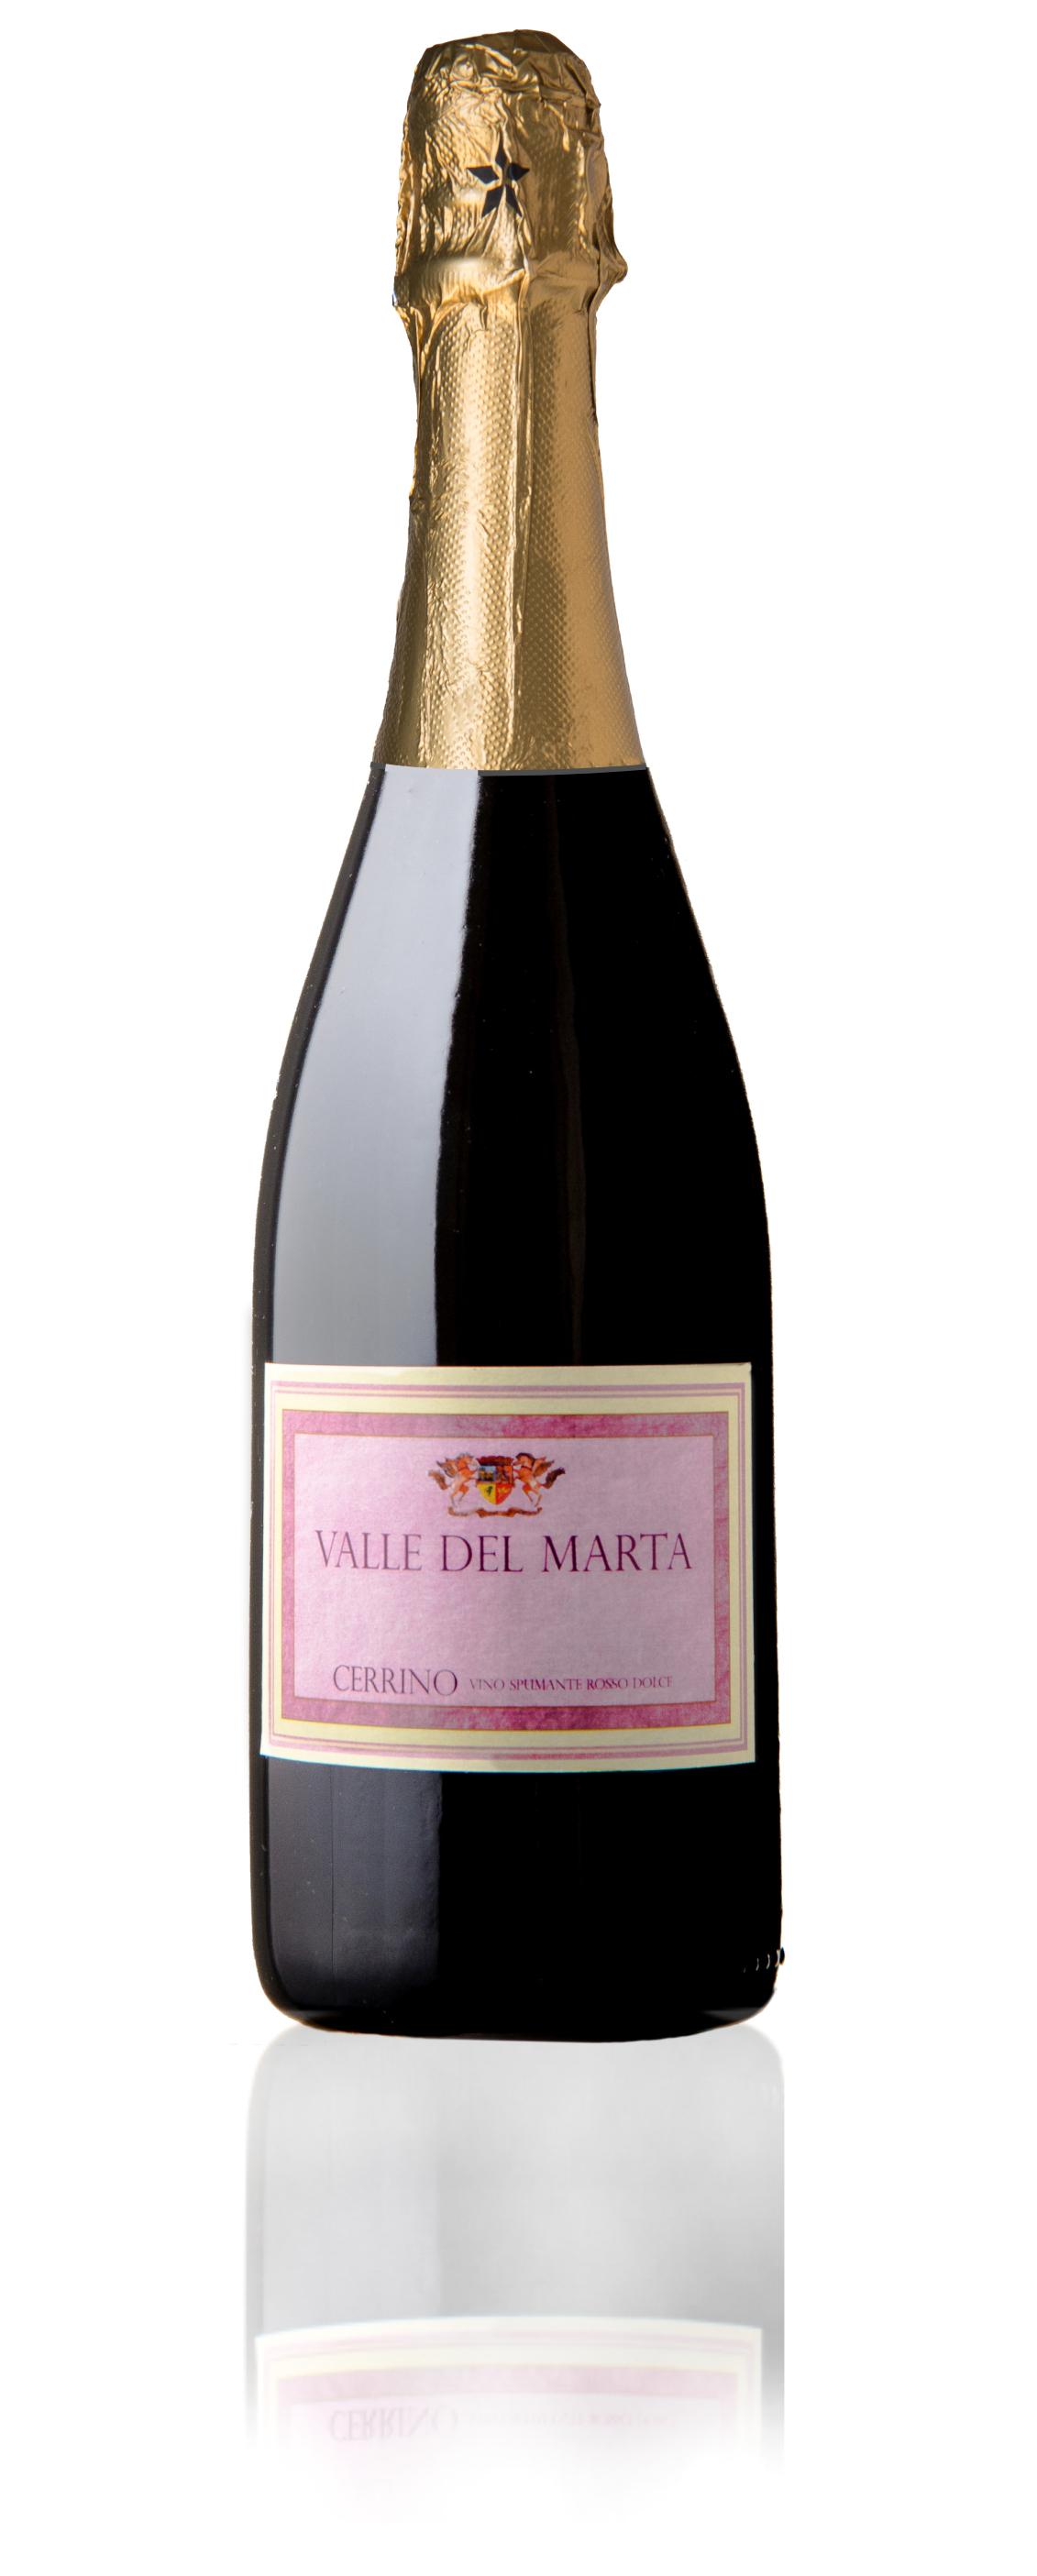 vino spumante dolce rosso cerrino tarquinia